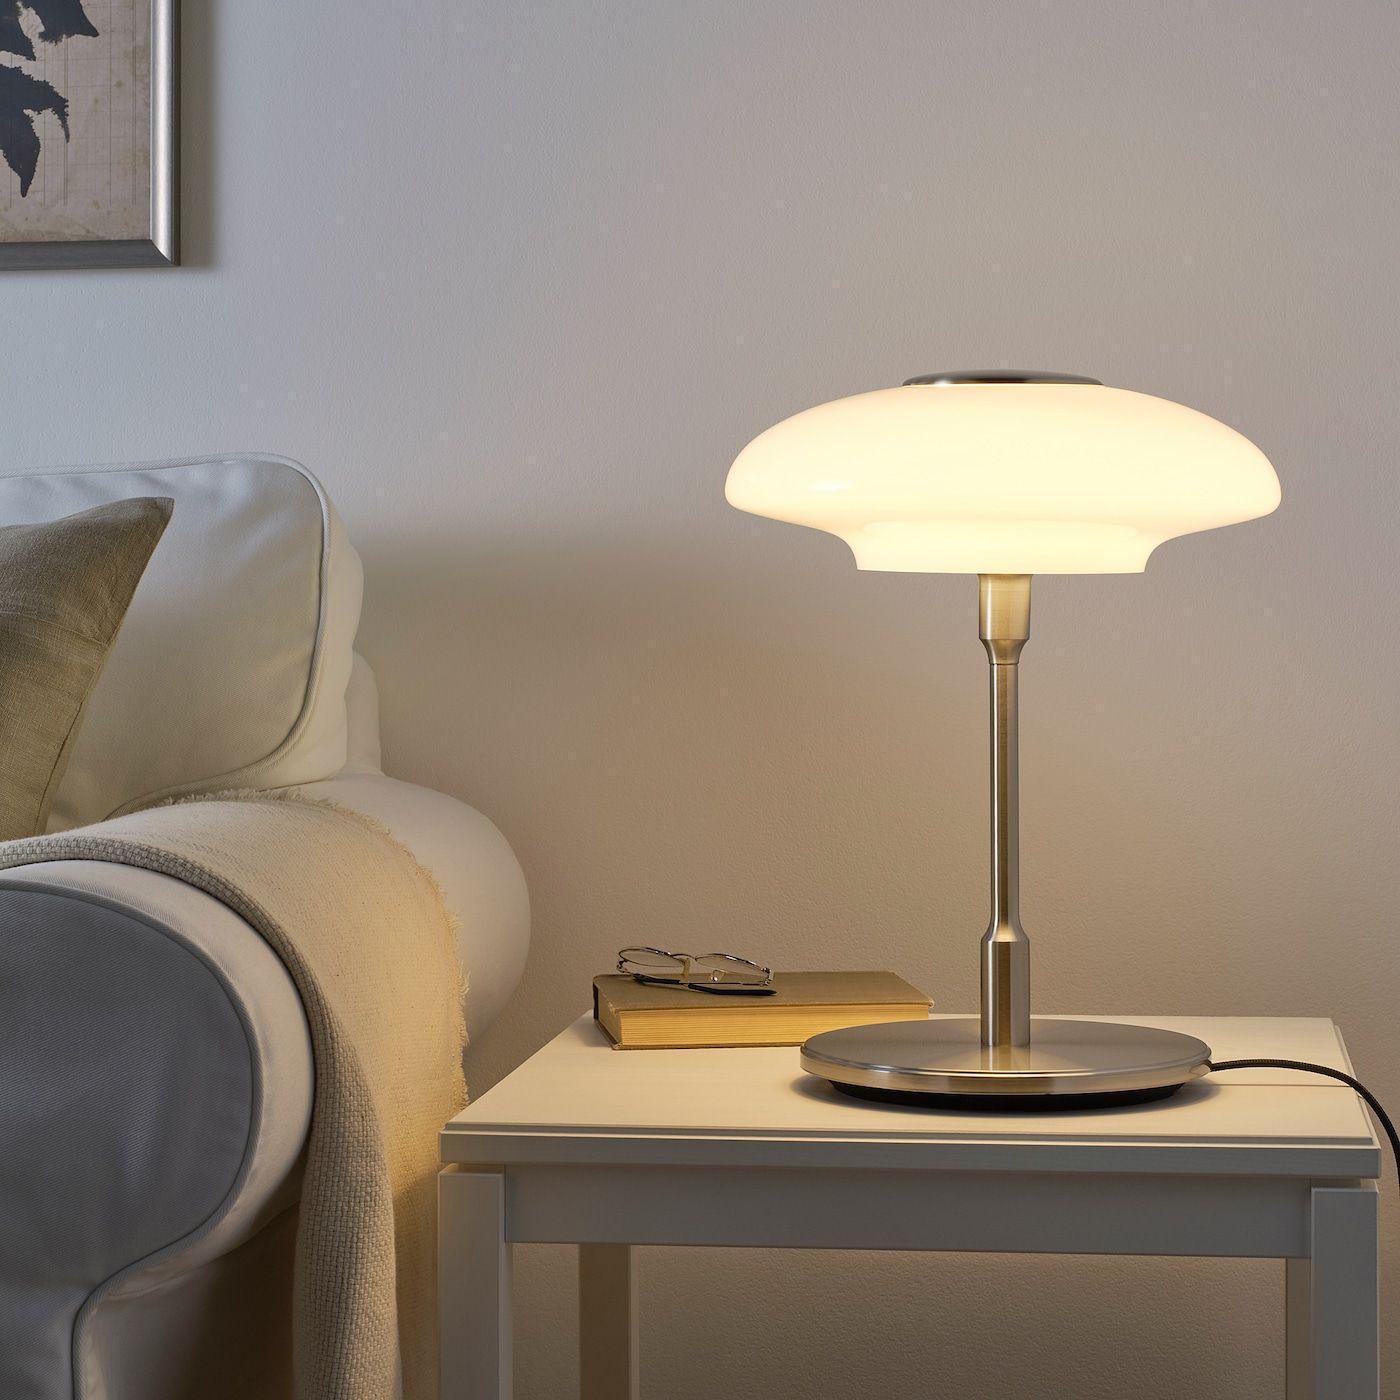 Ikea Lampe Strahler